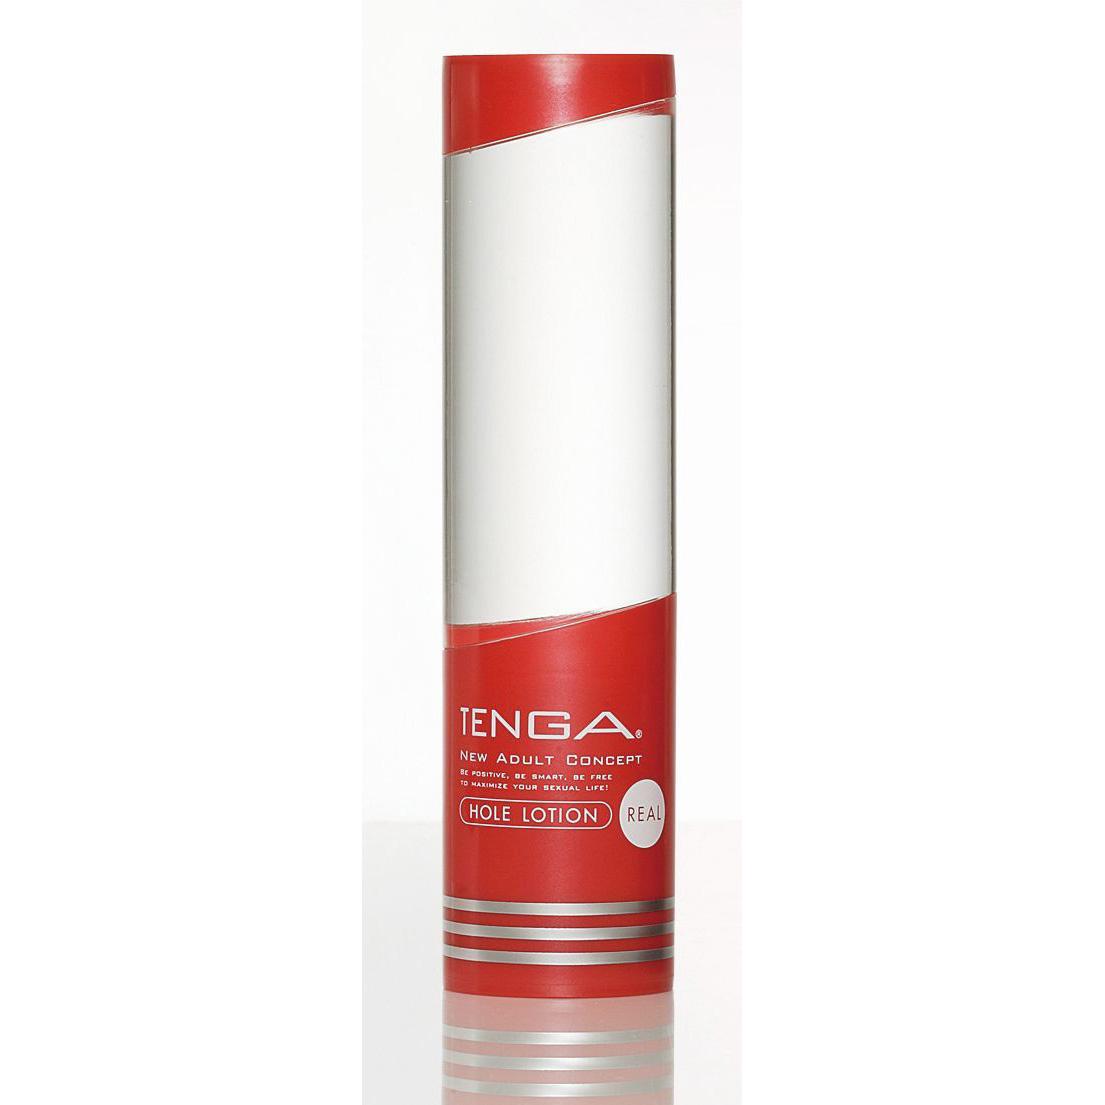 TENGA Hole Lotion 5.75 fl.oz. – Real